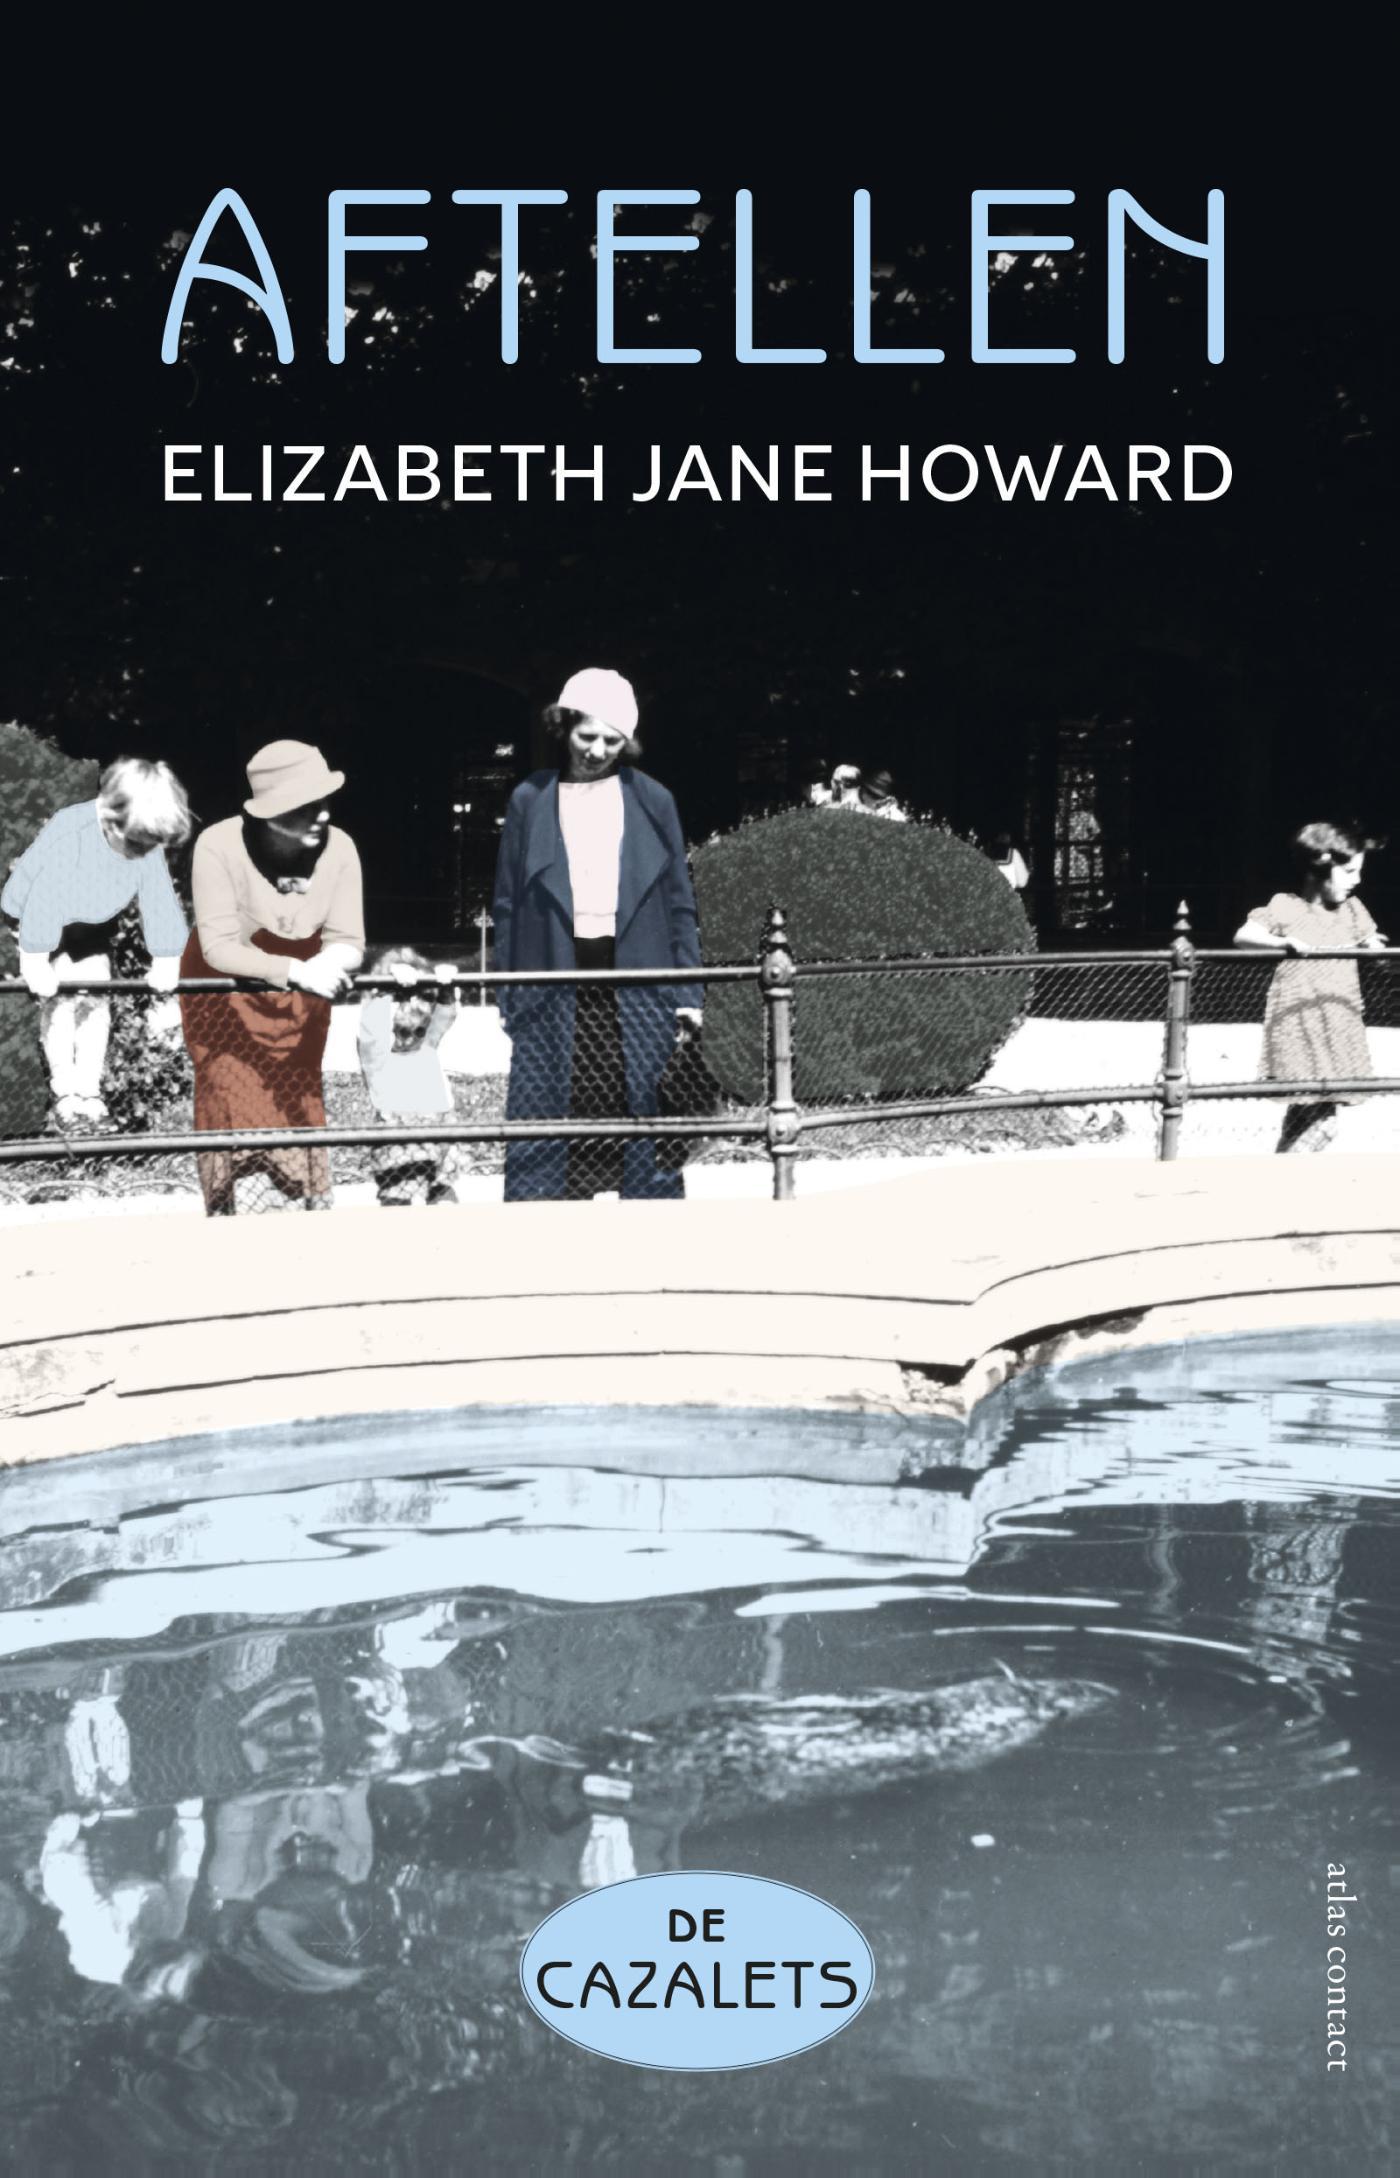 Elizabeth Jane Howard - Aftellen